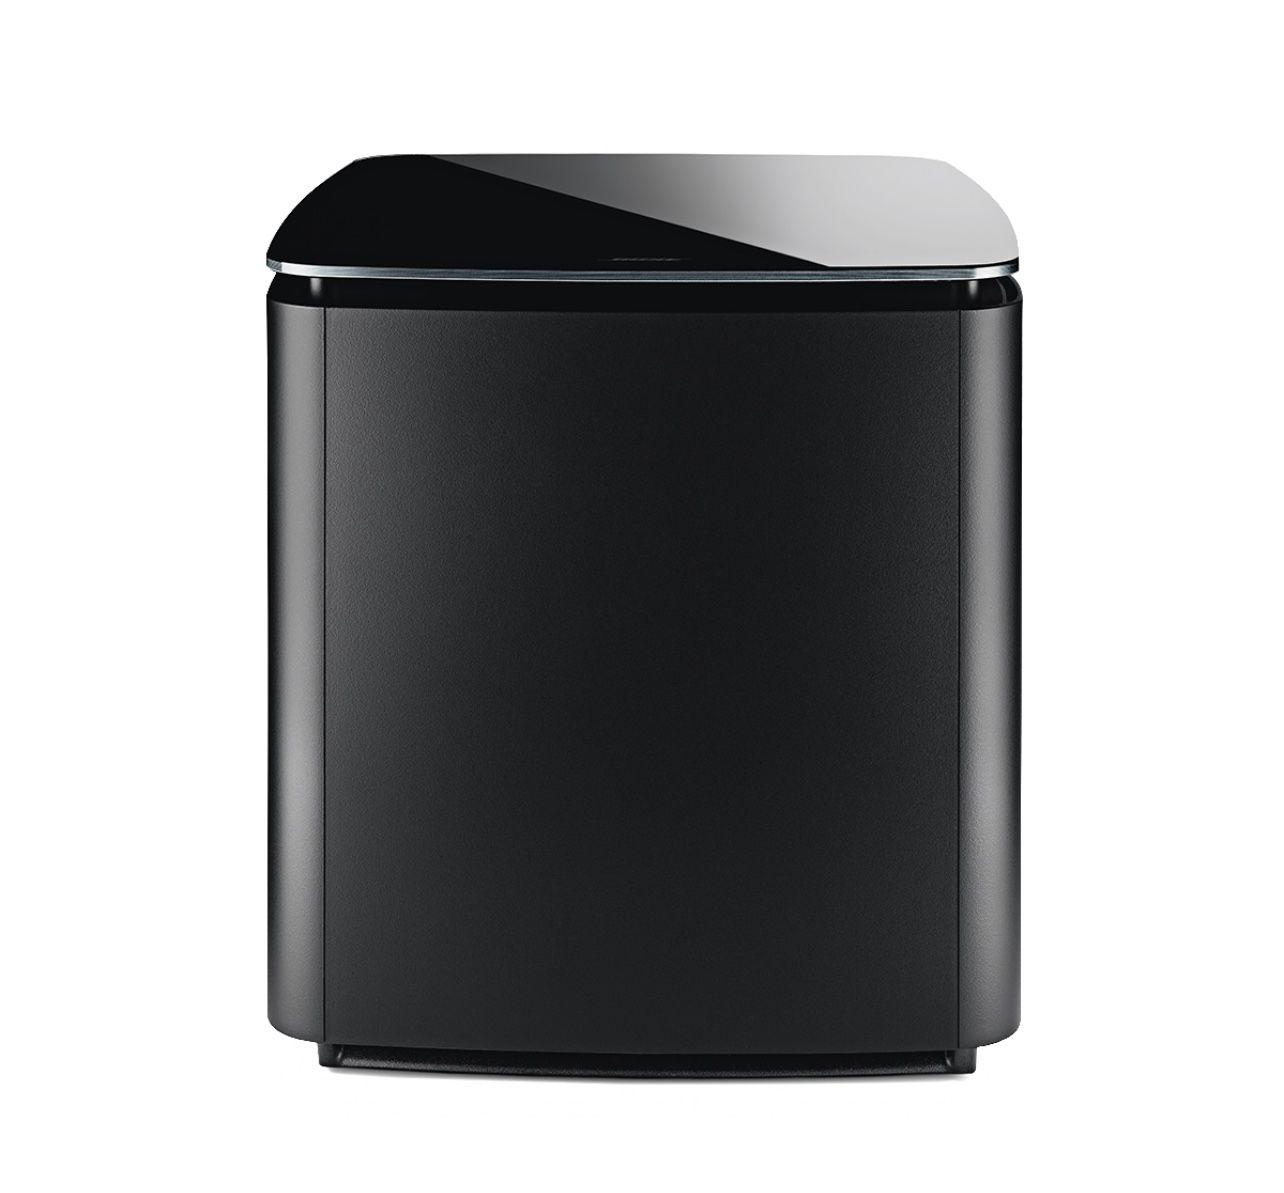 Bose Bass Module 700 for Soundbar 700 Bose Black Subwoofer Wireless Home Theater Sub New